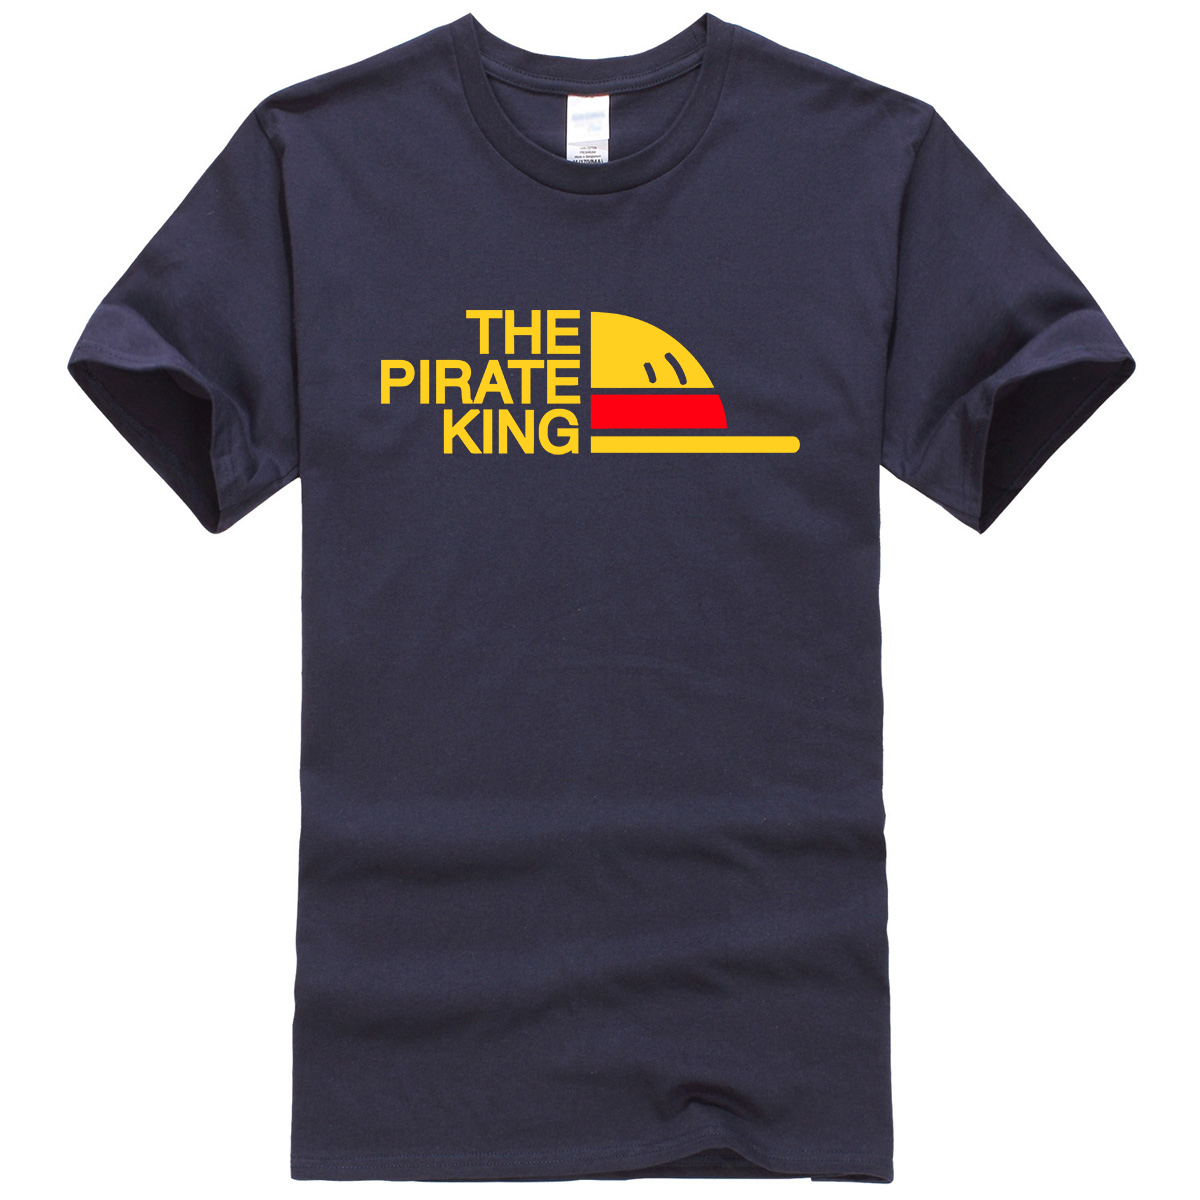 2019 Summer Casual   T     Shirt   Men Anime One Piece Man's   T  -  shirt   Cotton Top THE PIRATE KING Streetwear Mens   T  -  shirts   Harajuku Tshirt